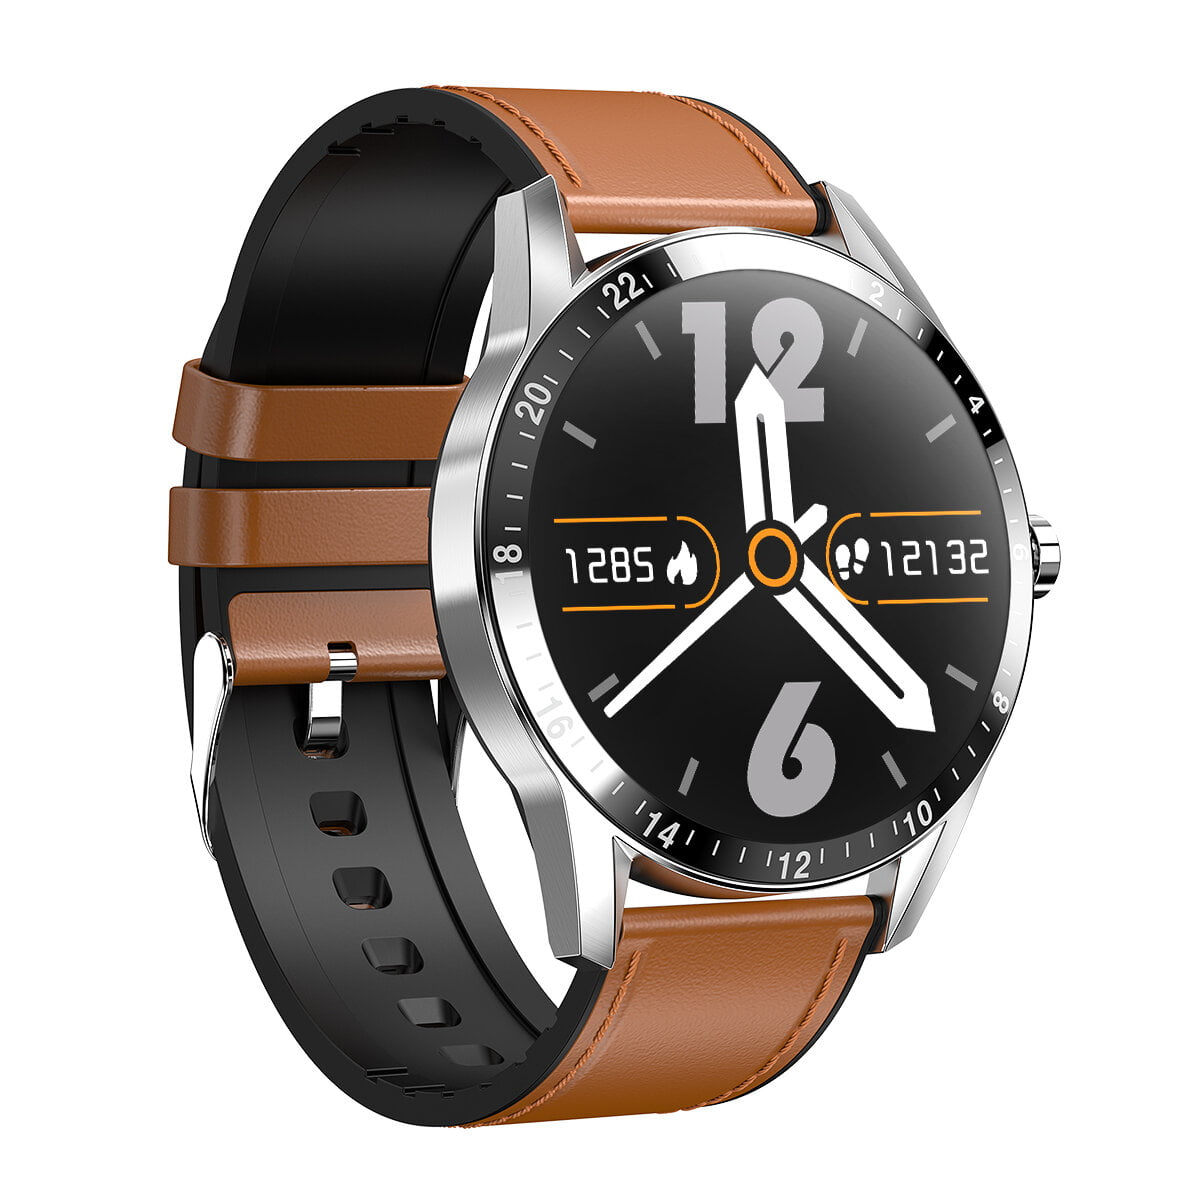 G20 Smart Watch heart rate blood pressure monitor ip67 smart watch wholesale (2)